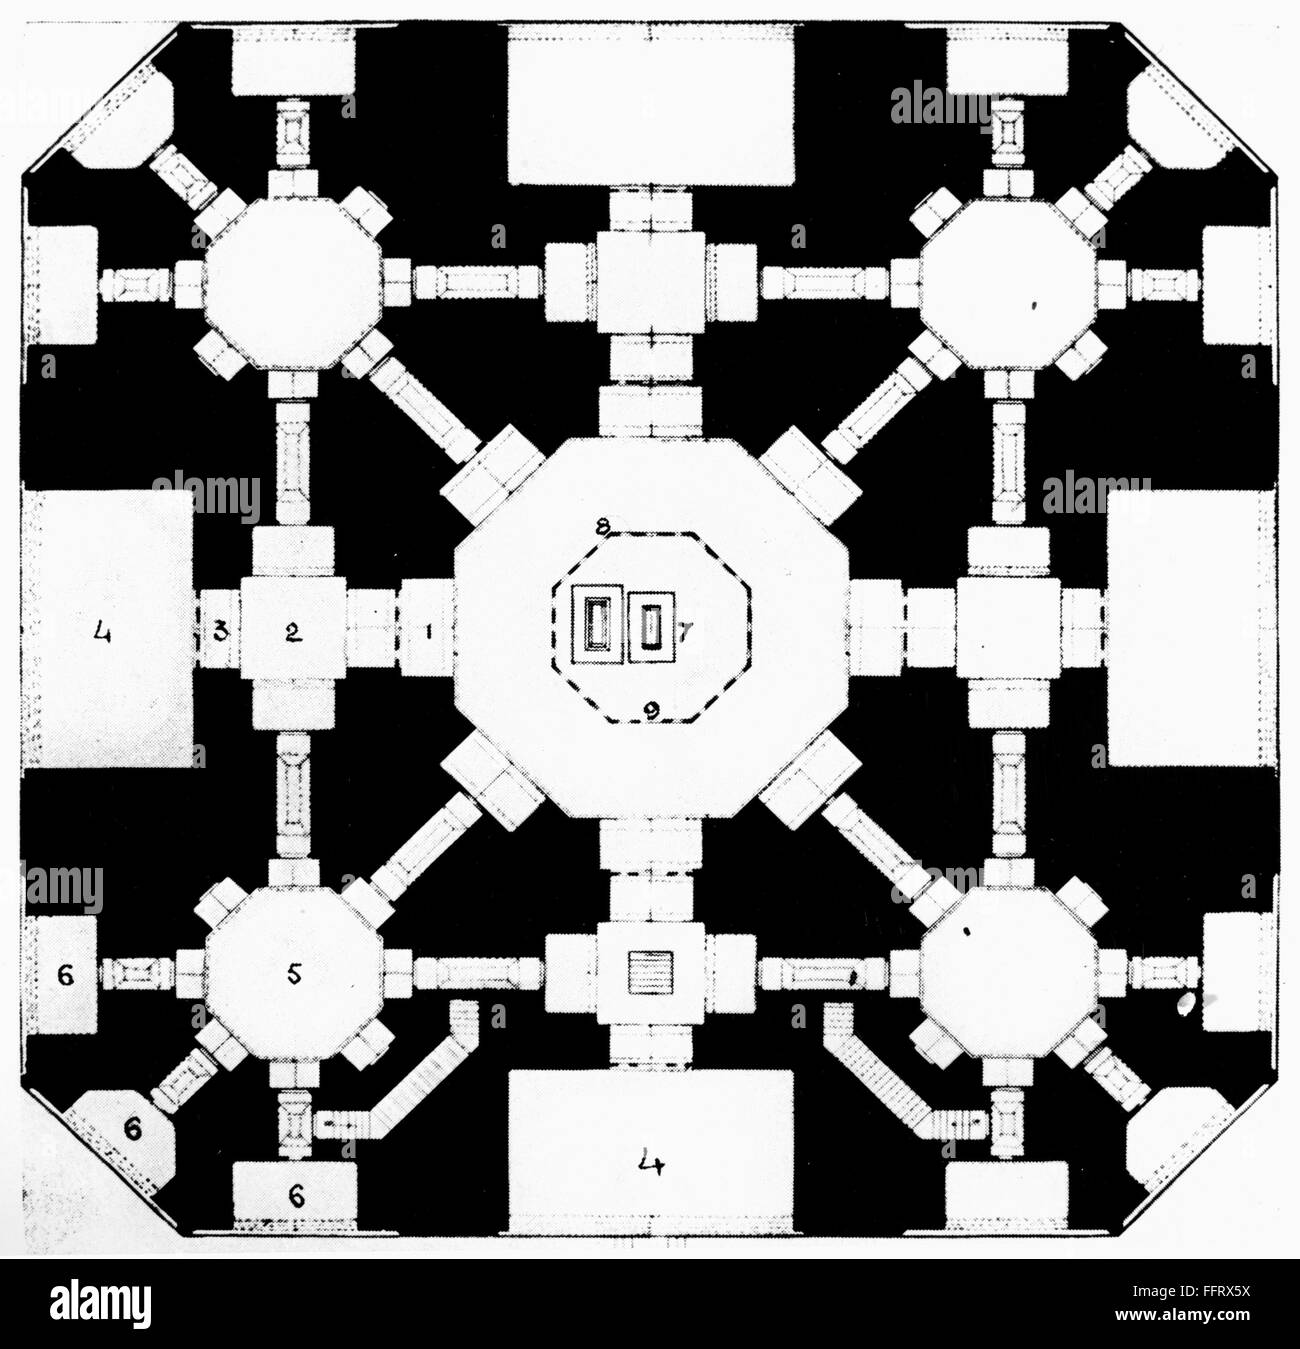 2008 Toyota Fj Cruiser Fuse Box Diagram Ask Answer Wiring Taj Mahal Floor Plan Free Download Land 2011